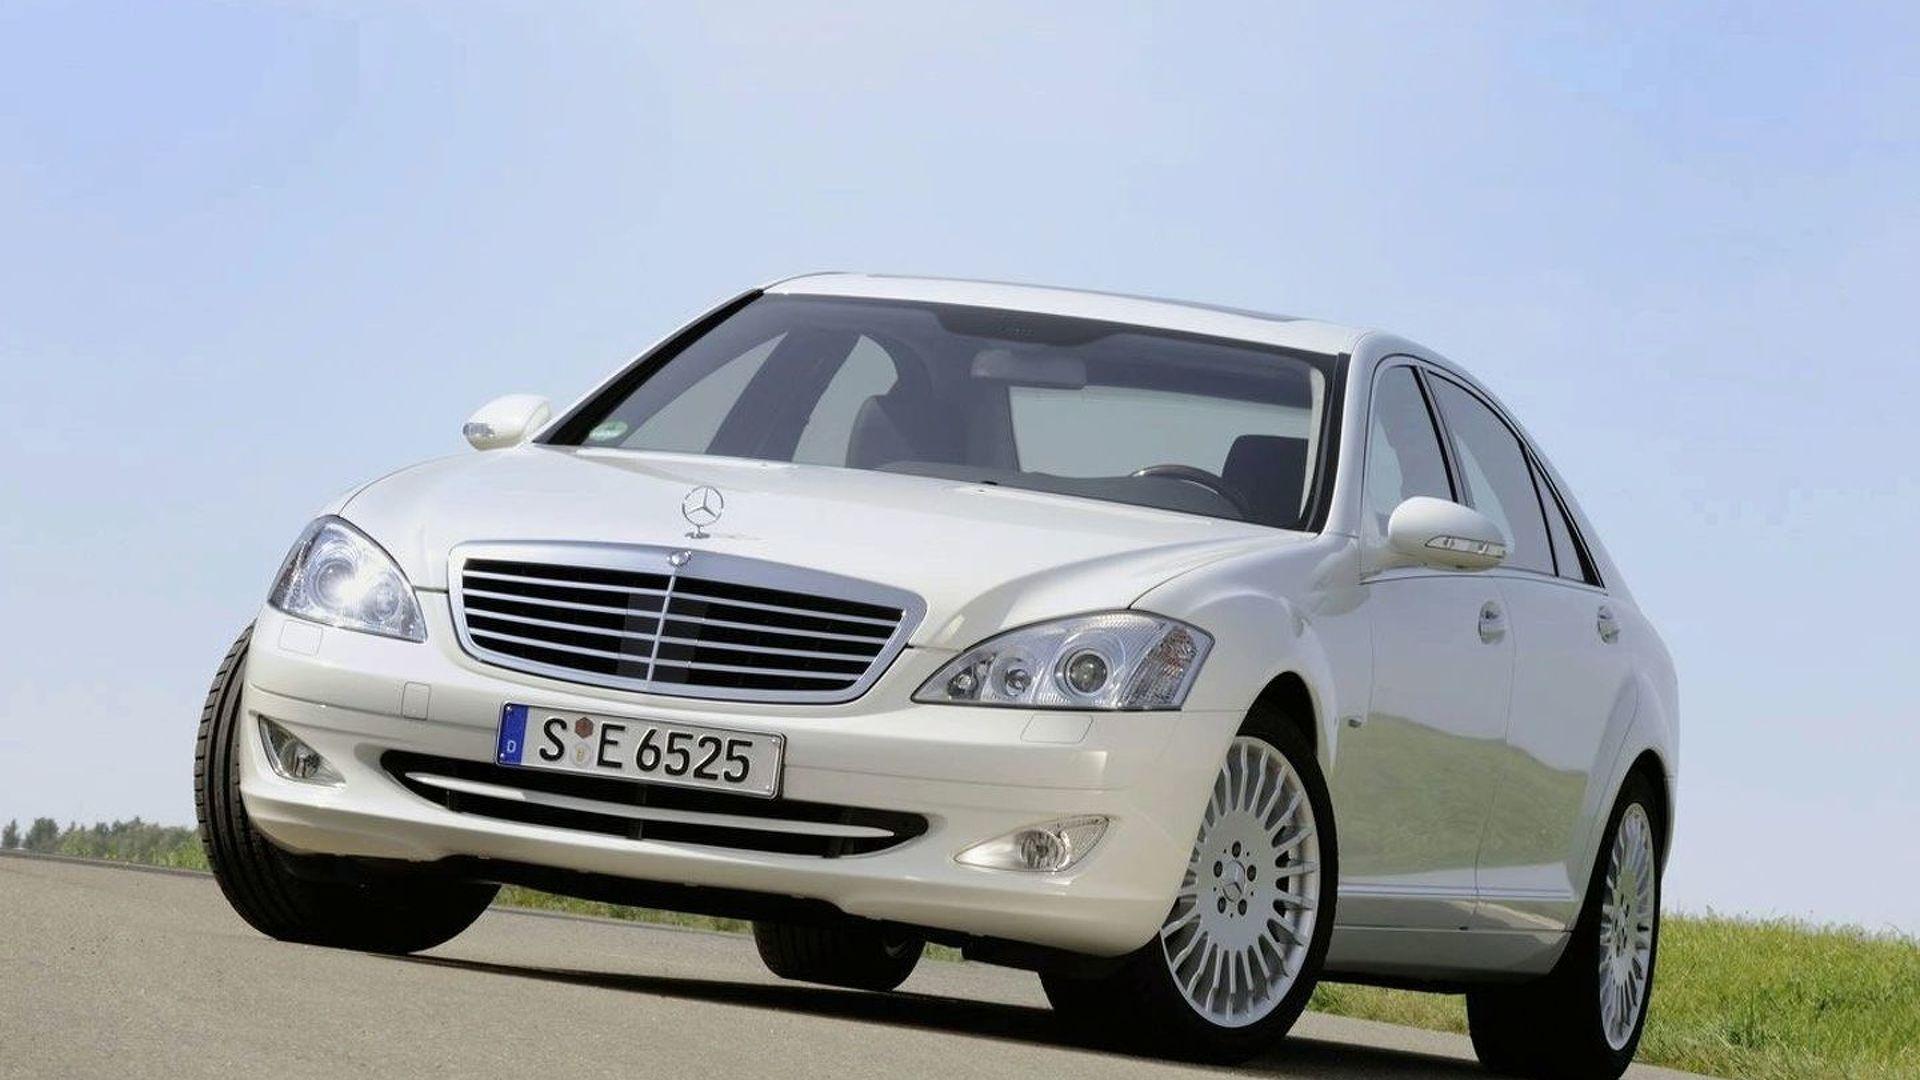 Mercedes-Benz S 320 CDI BlueEFFICIENCY Announced